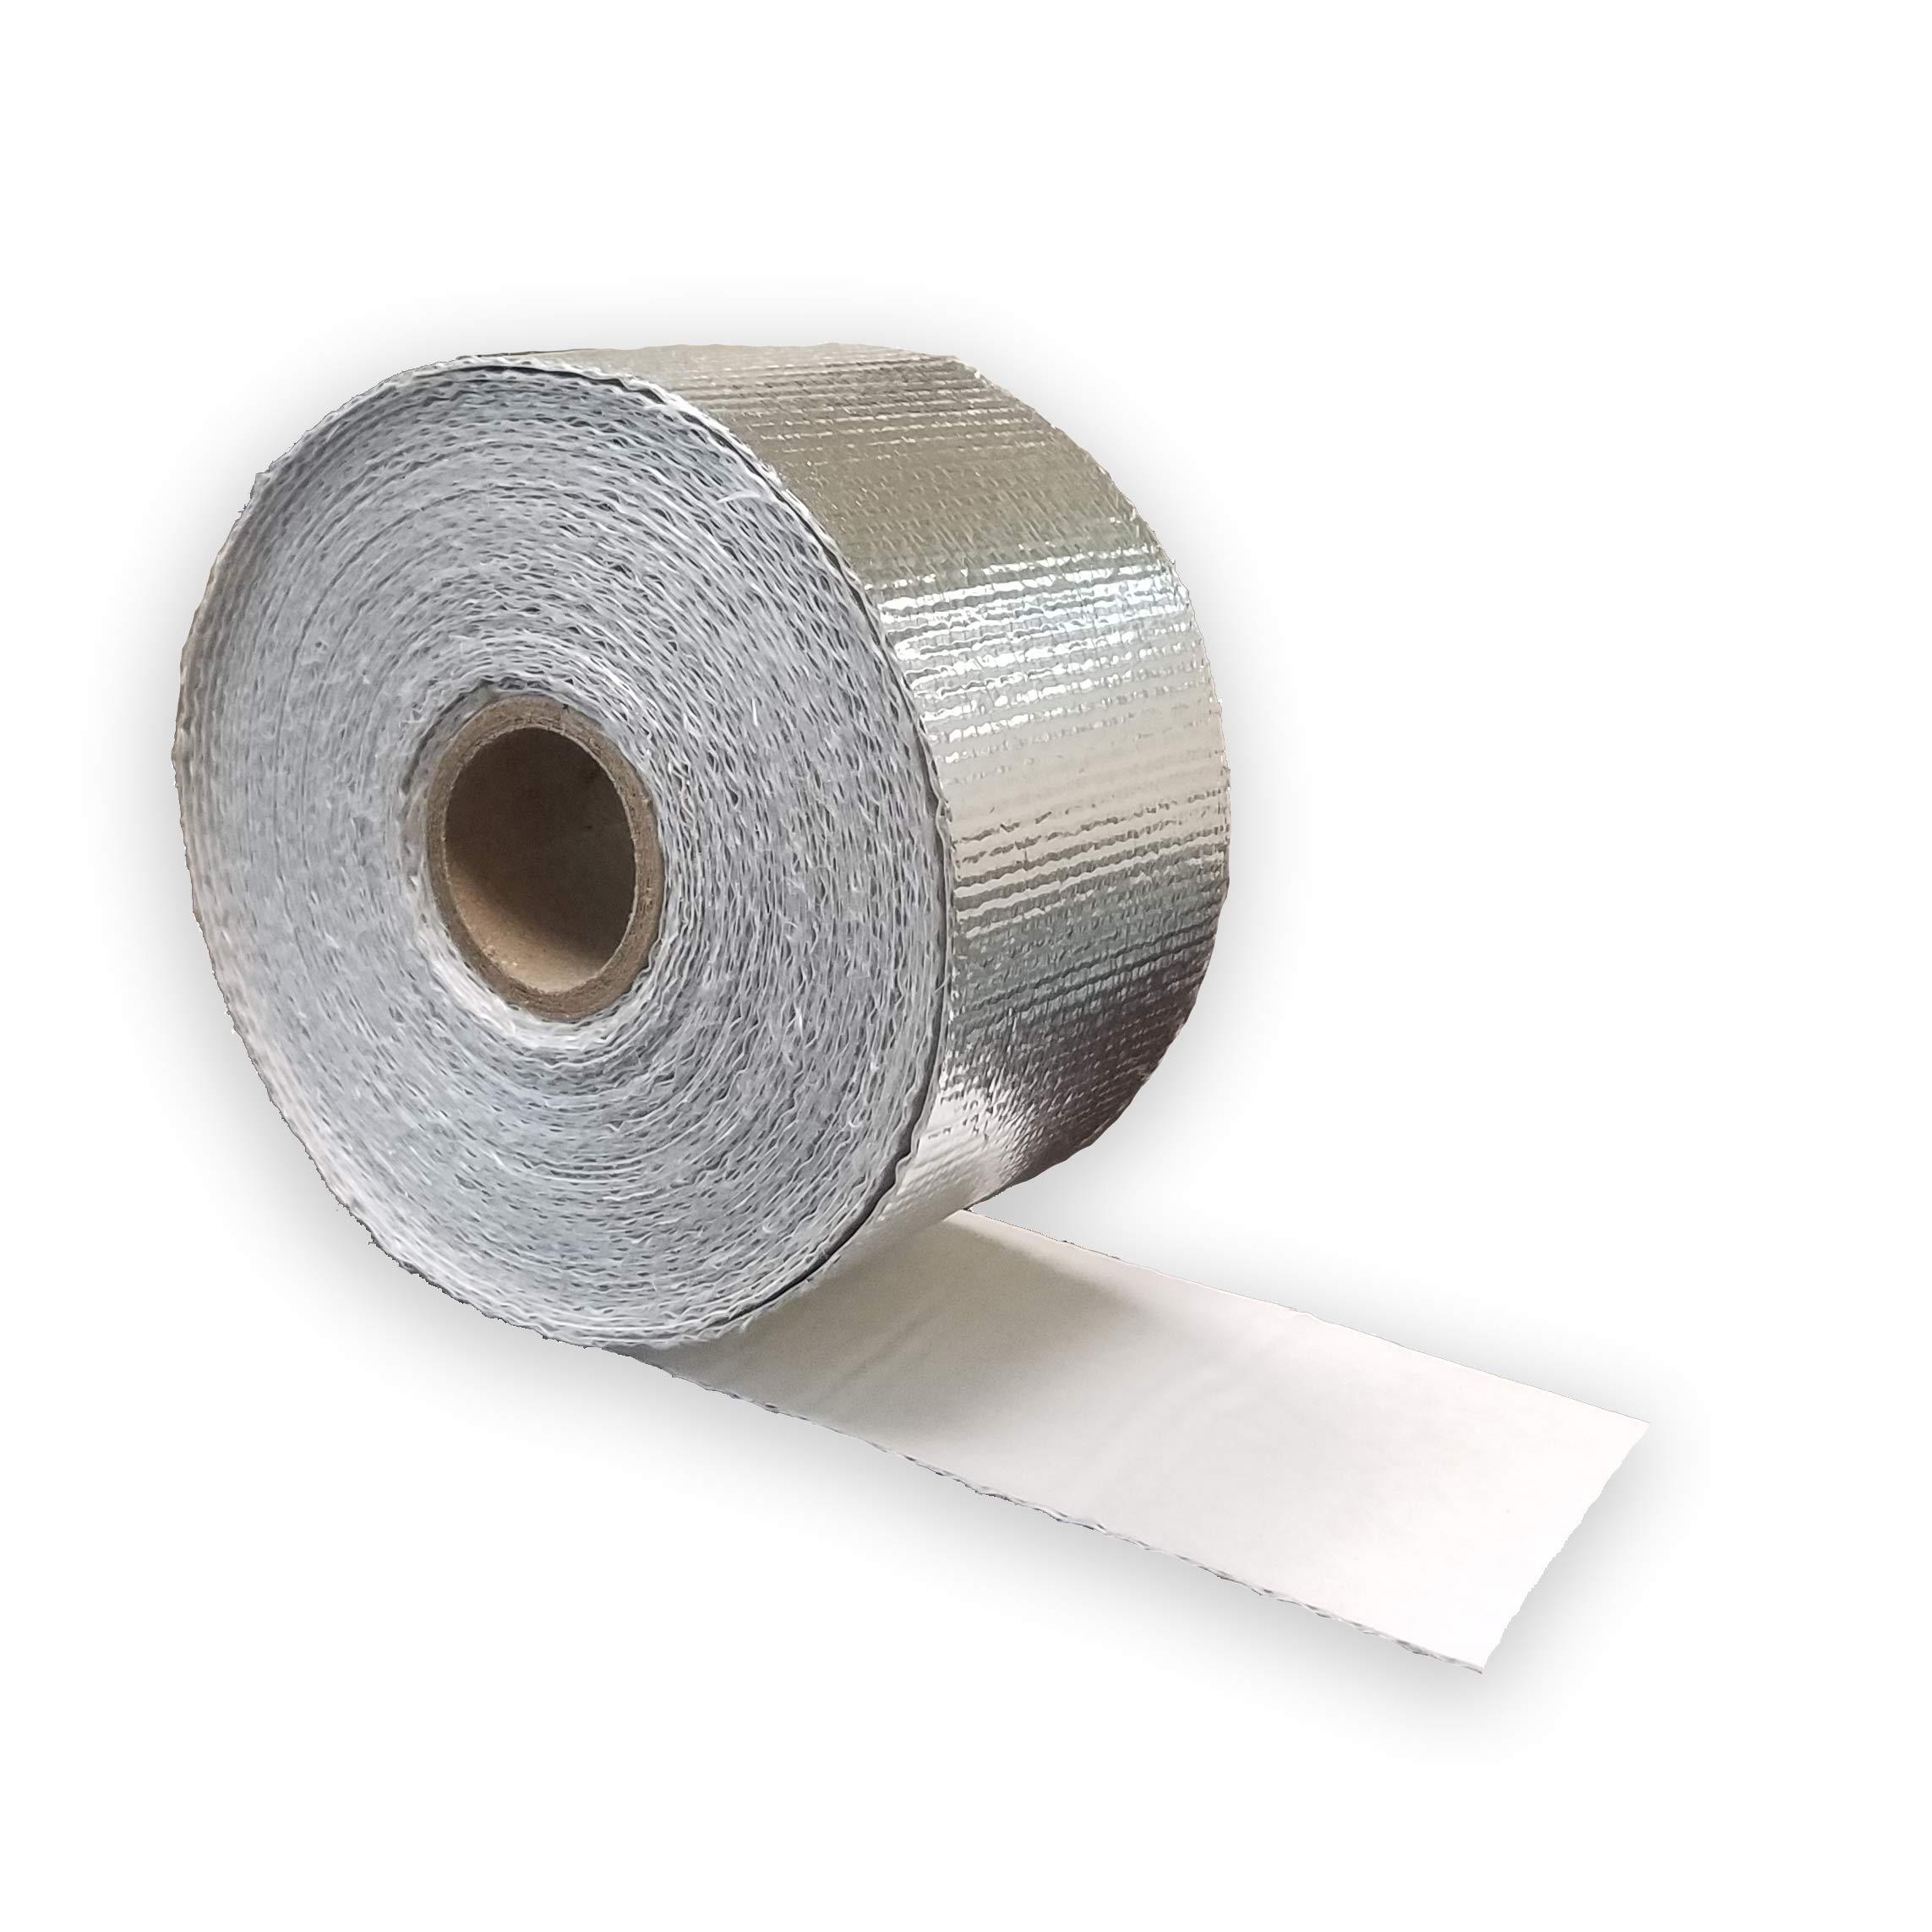 Newtex Z-Flex Self-Adhesive Heat Reflective Tape (2.0'' x 25')